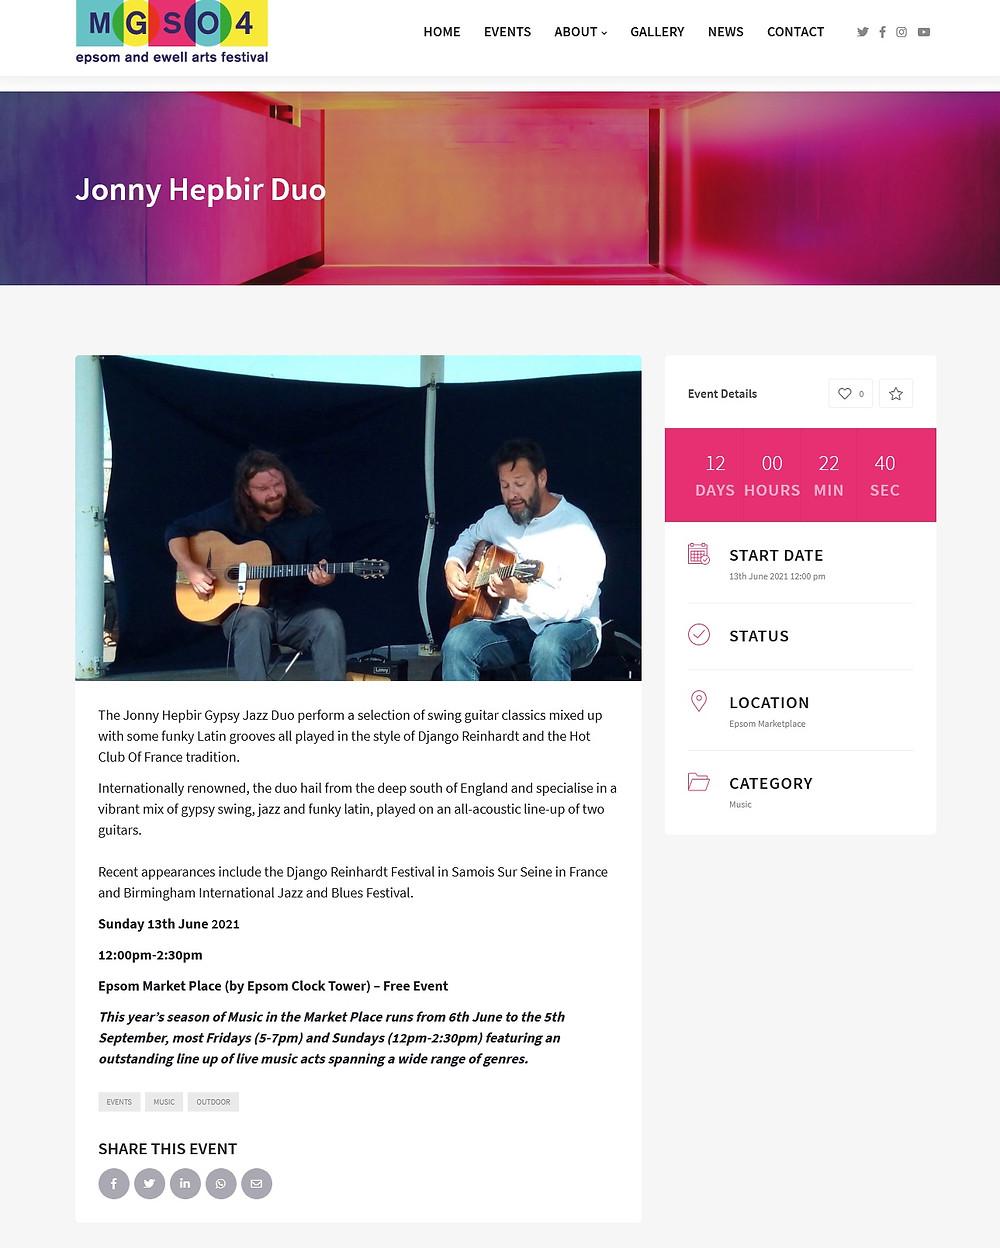 Jonny Hepbir Gypsy Jazz Duo – Live at Epsom Market Place - Sunday 13th June 2021 midday